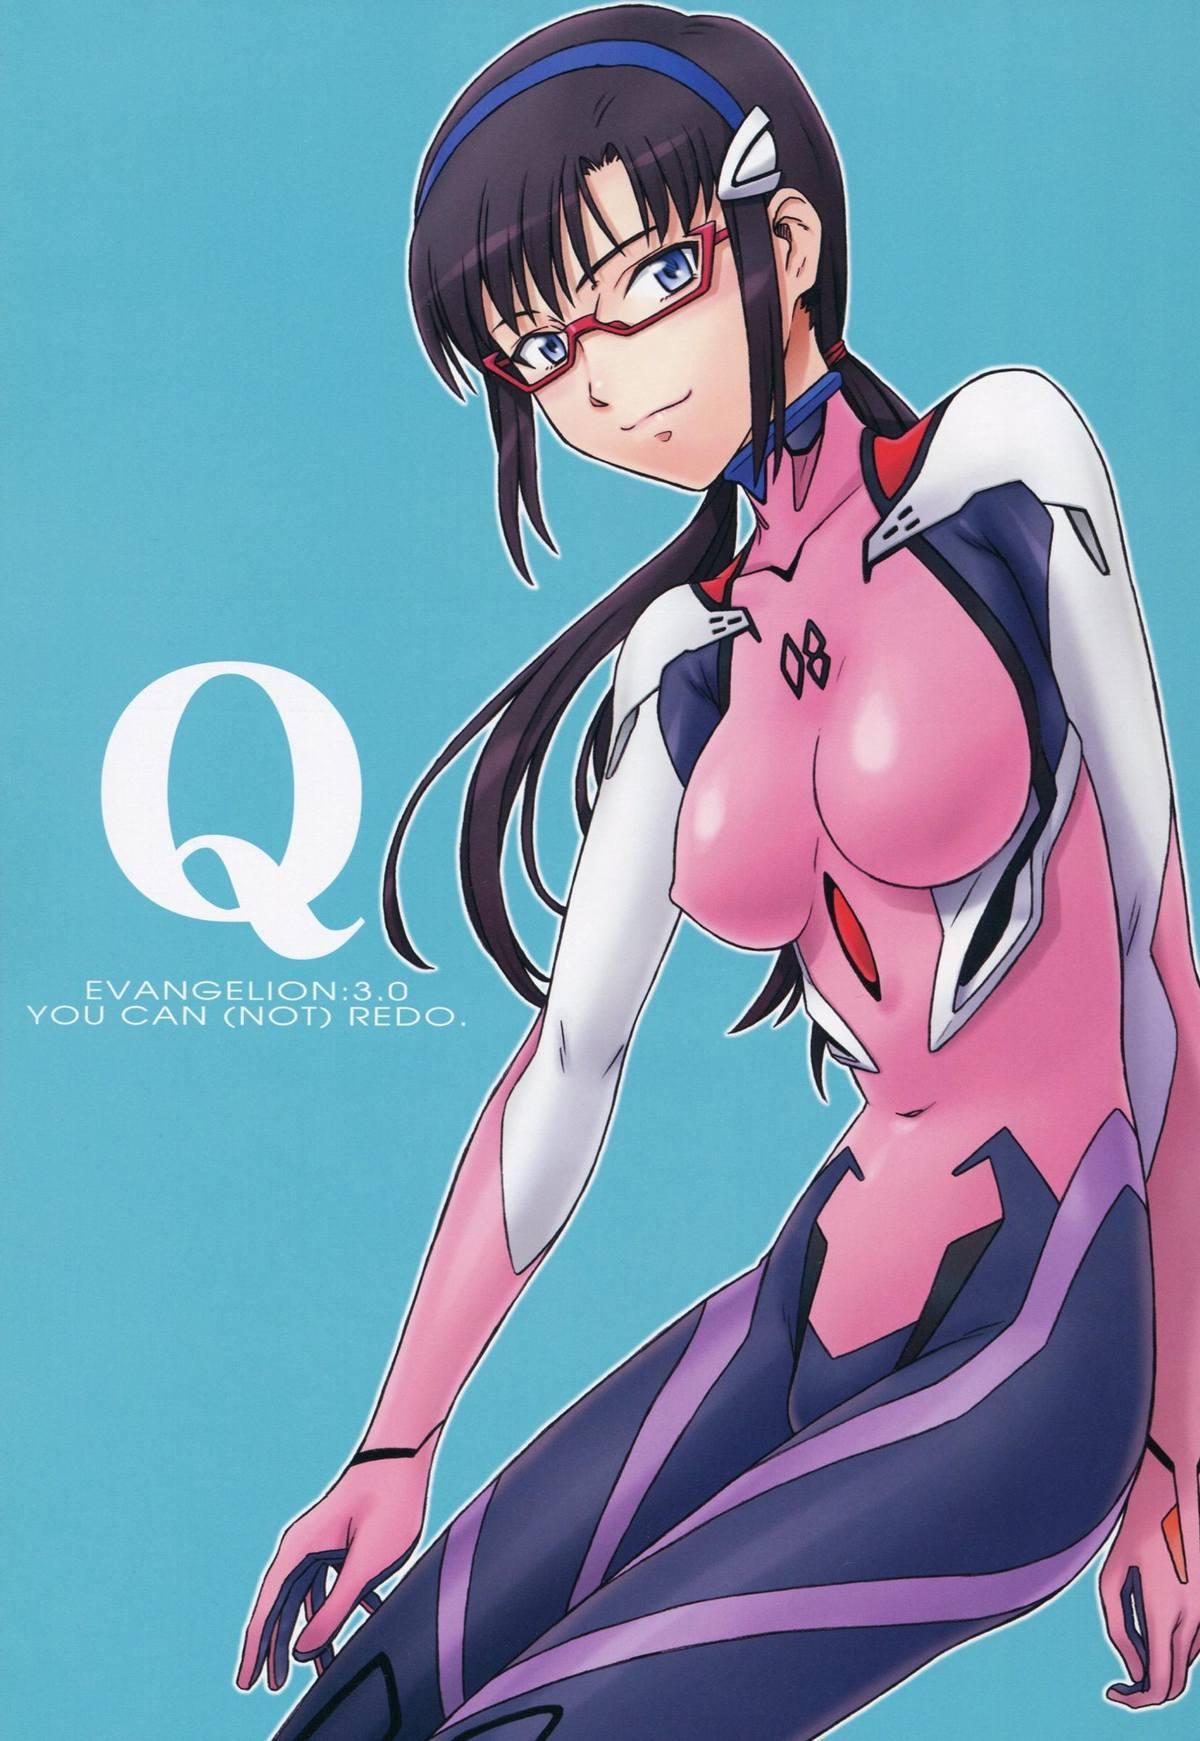 Quickening 1